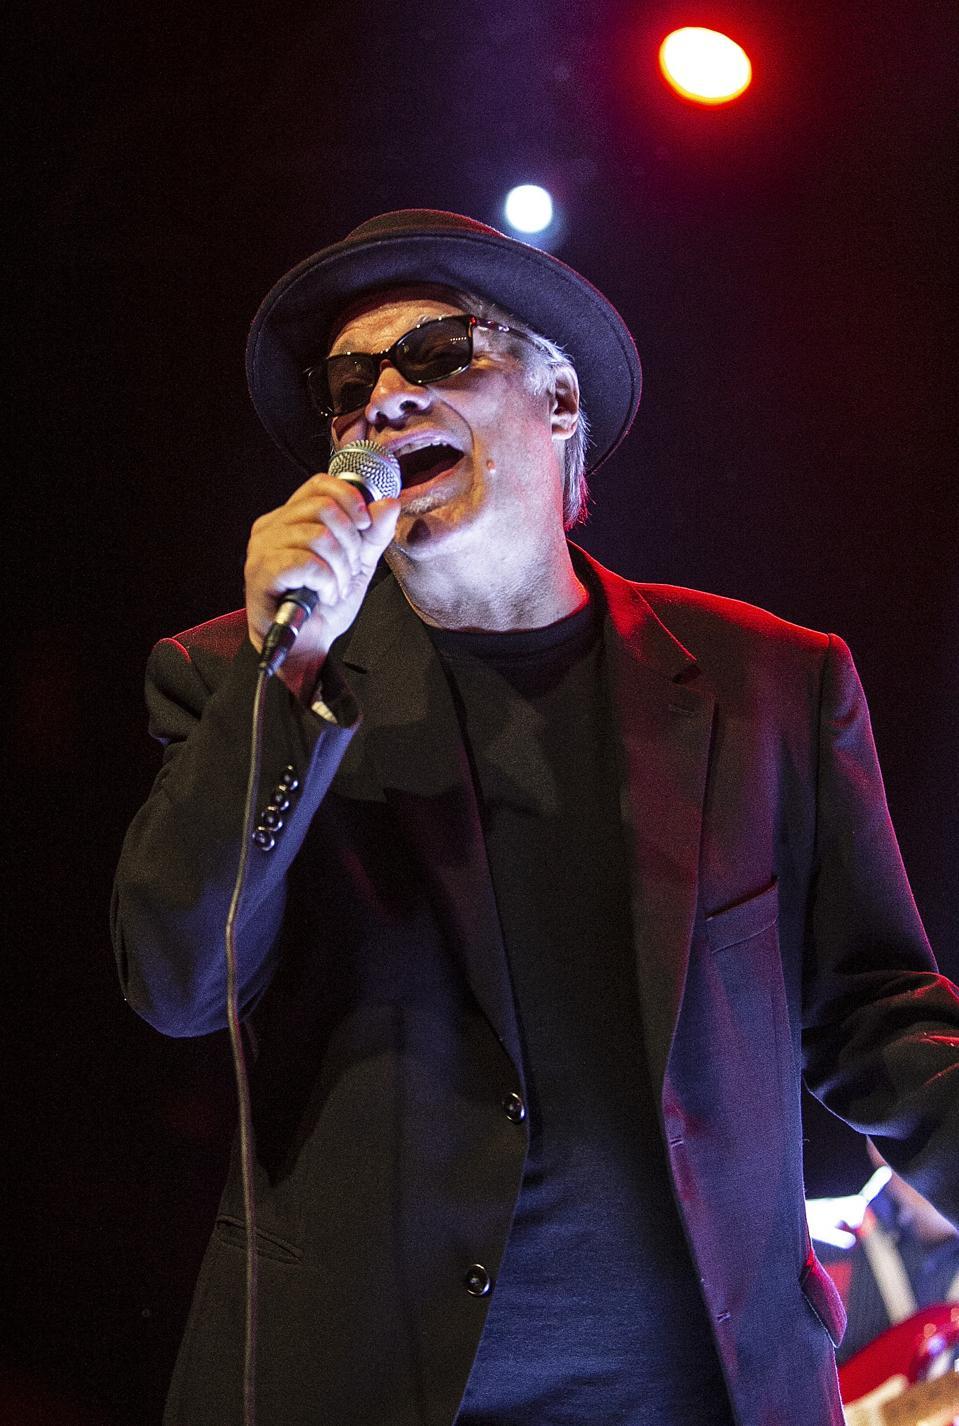 Curtis Salgado performing on stage